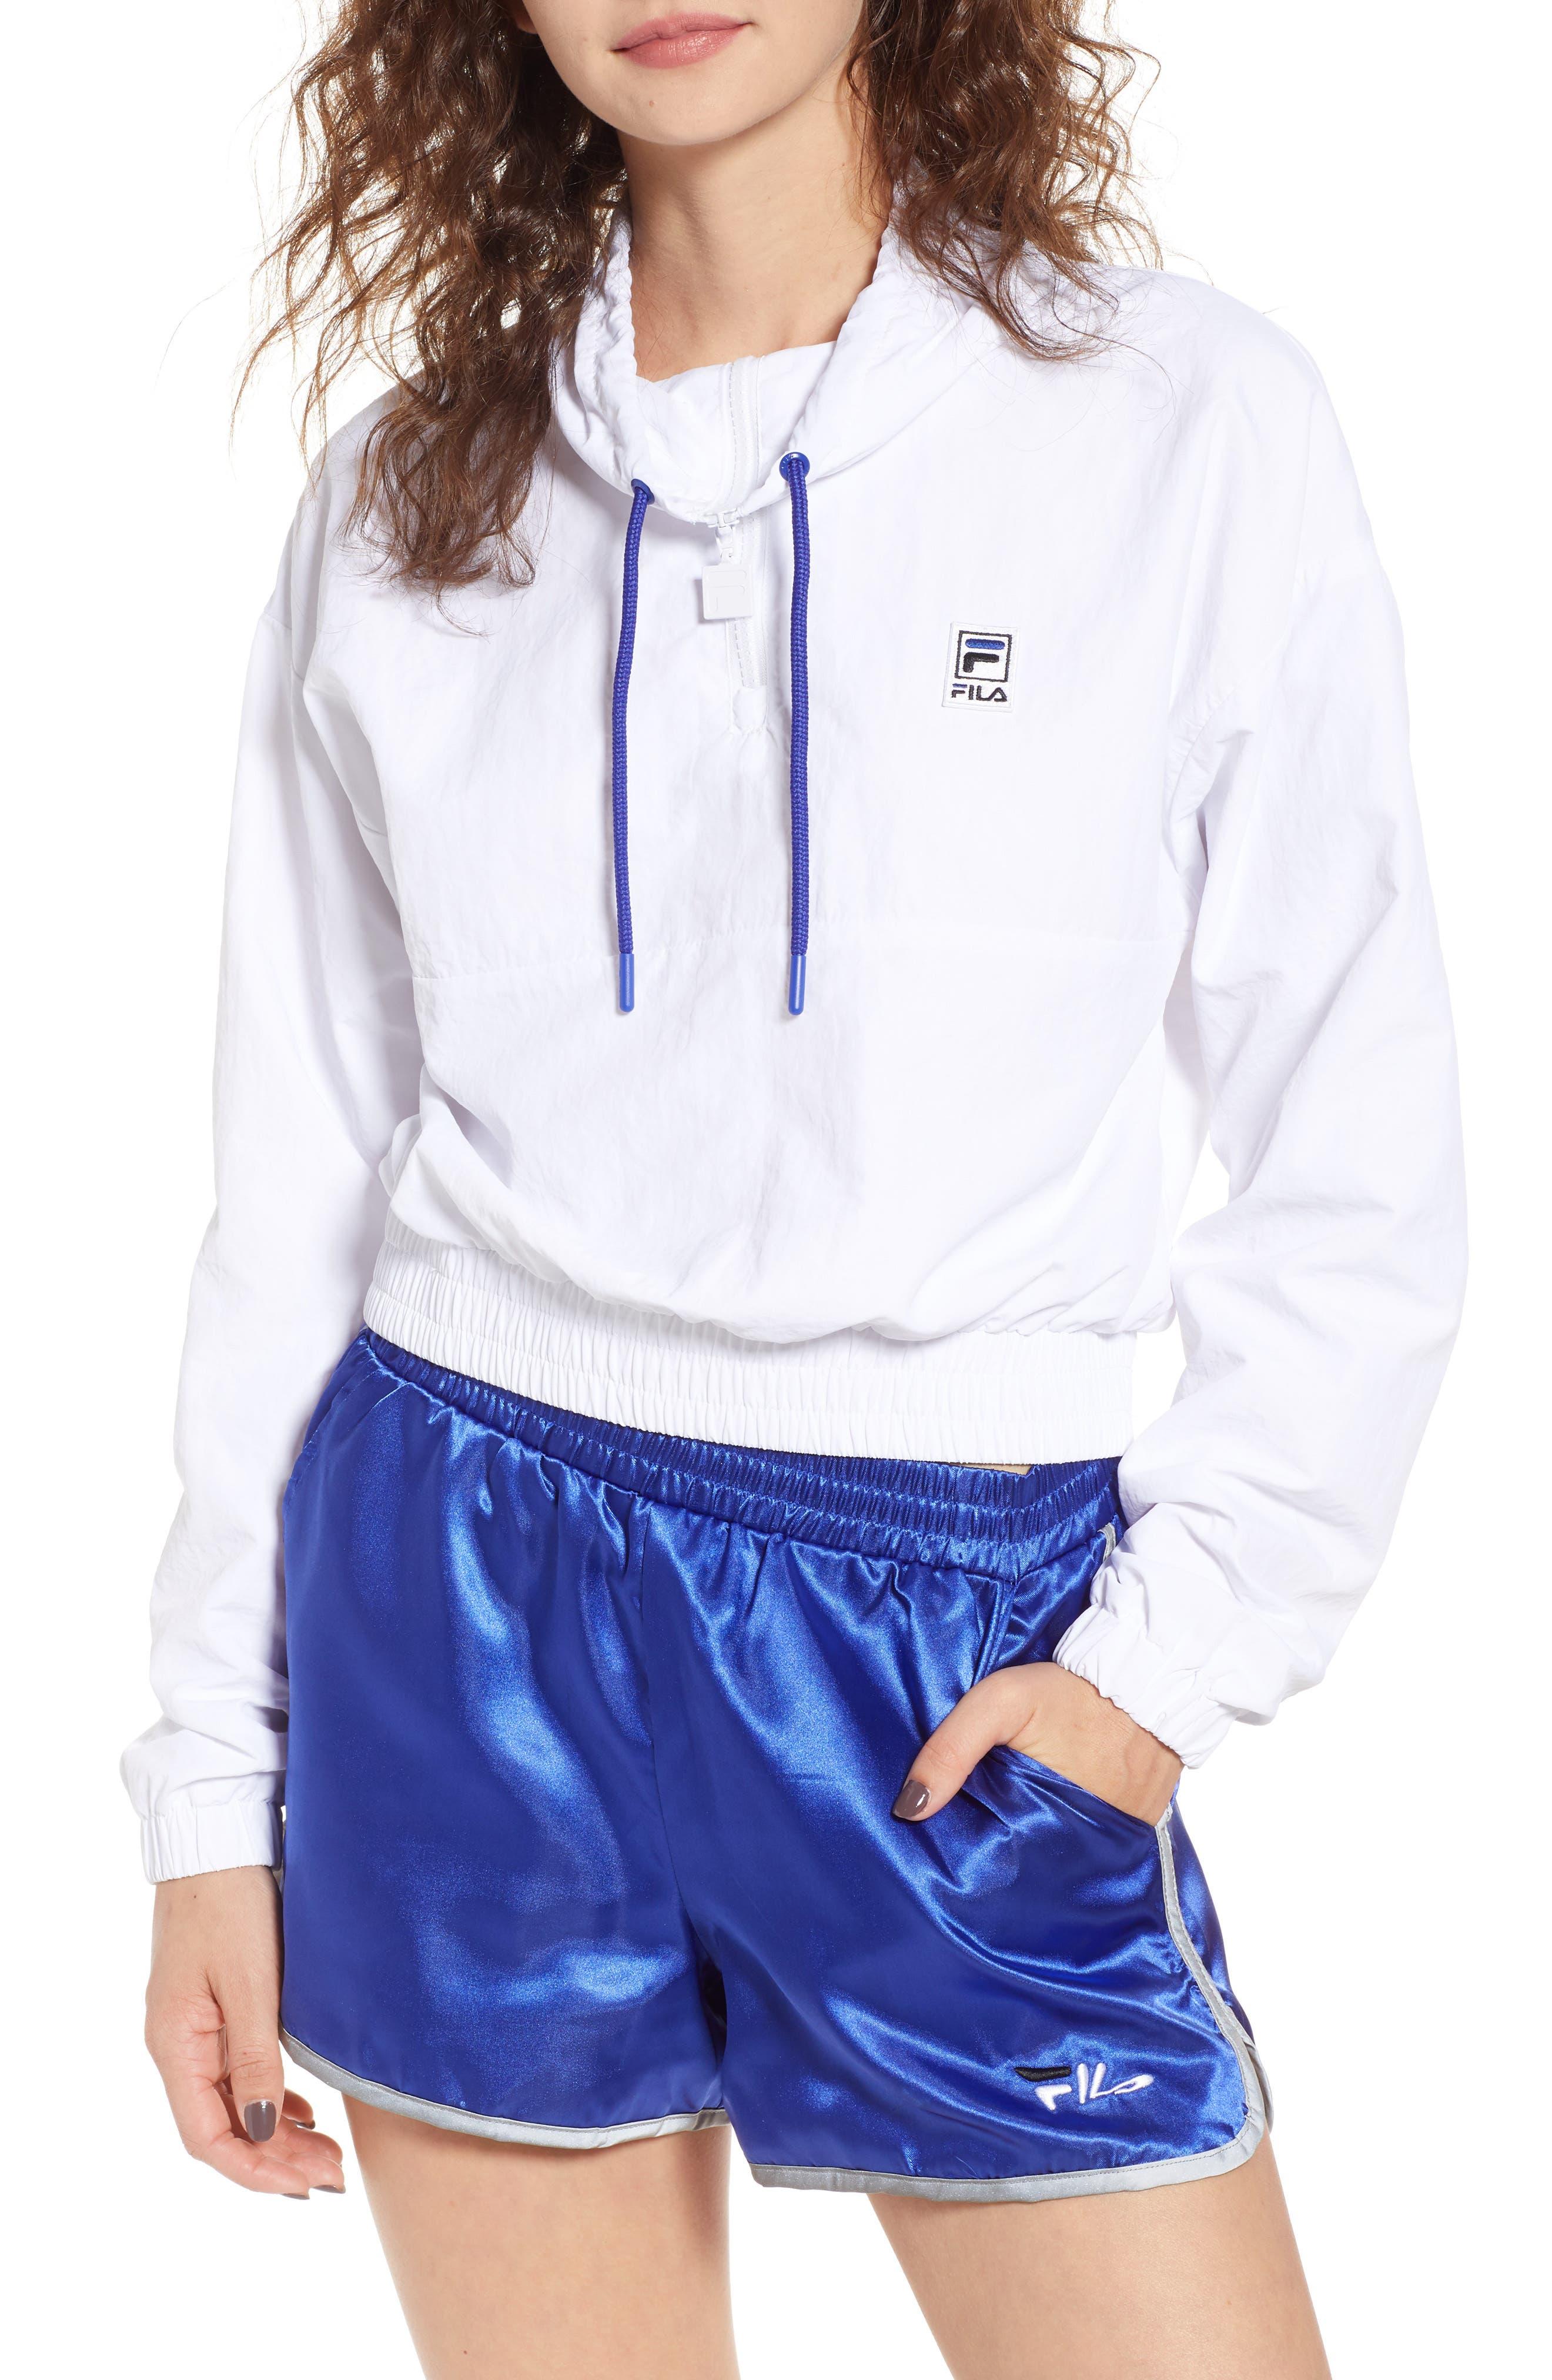 FILA Kayla Quarter Zip Nylon Pullover